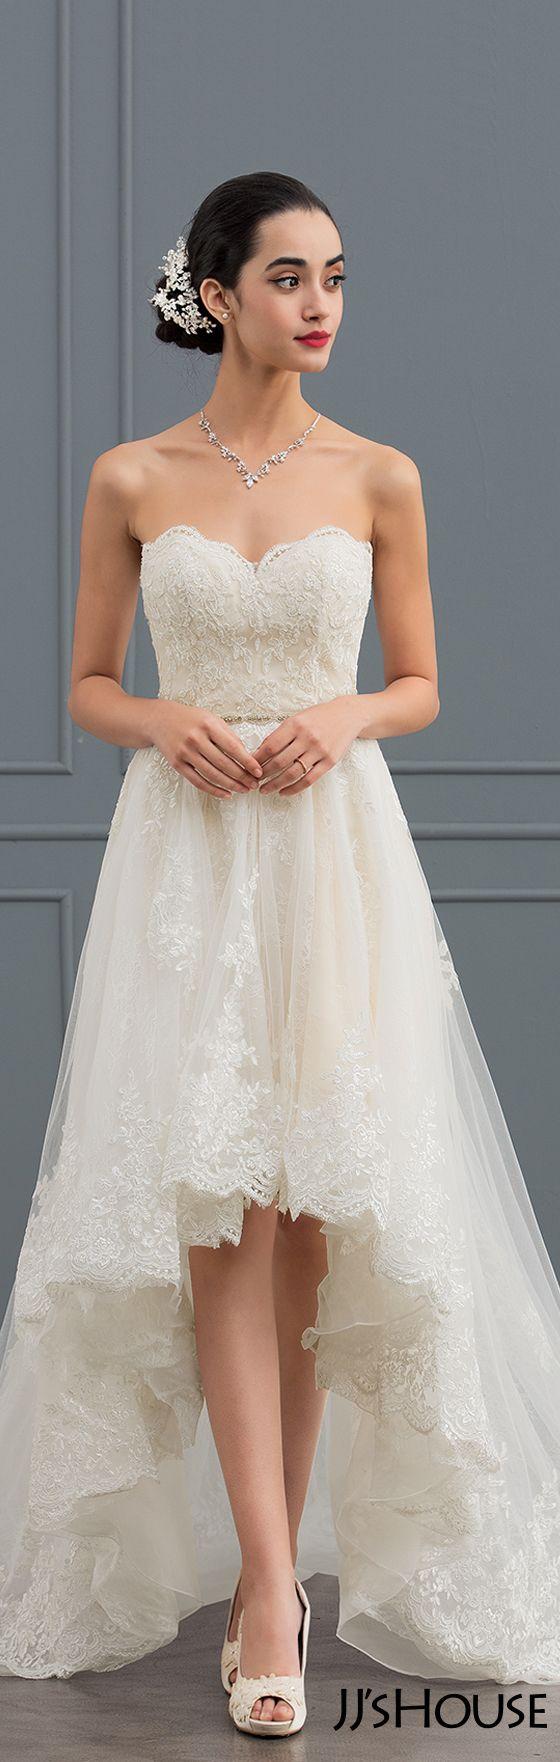 Alineprincess sweetheart asymmetrical tulle lace wedding dress